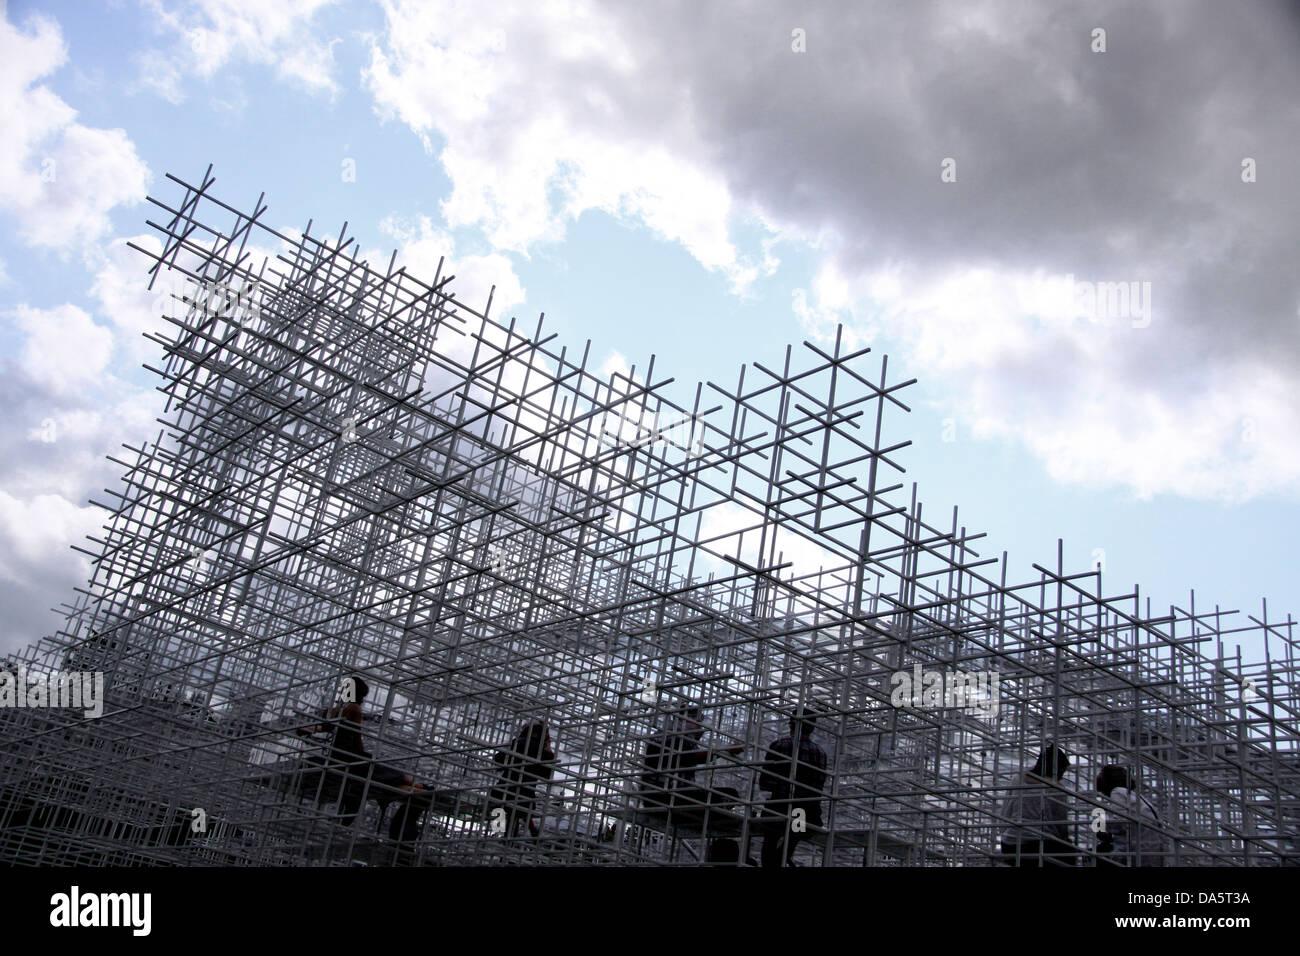 The Serpentine Gallery Pavilion, designed by Japanese architect Sou Fujimoto - Stock Image